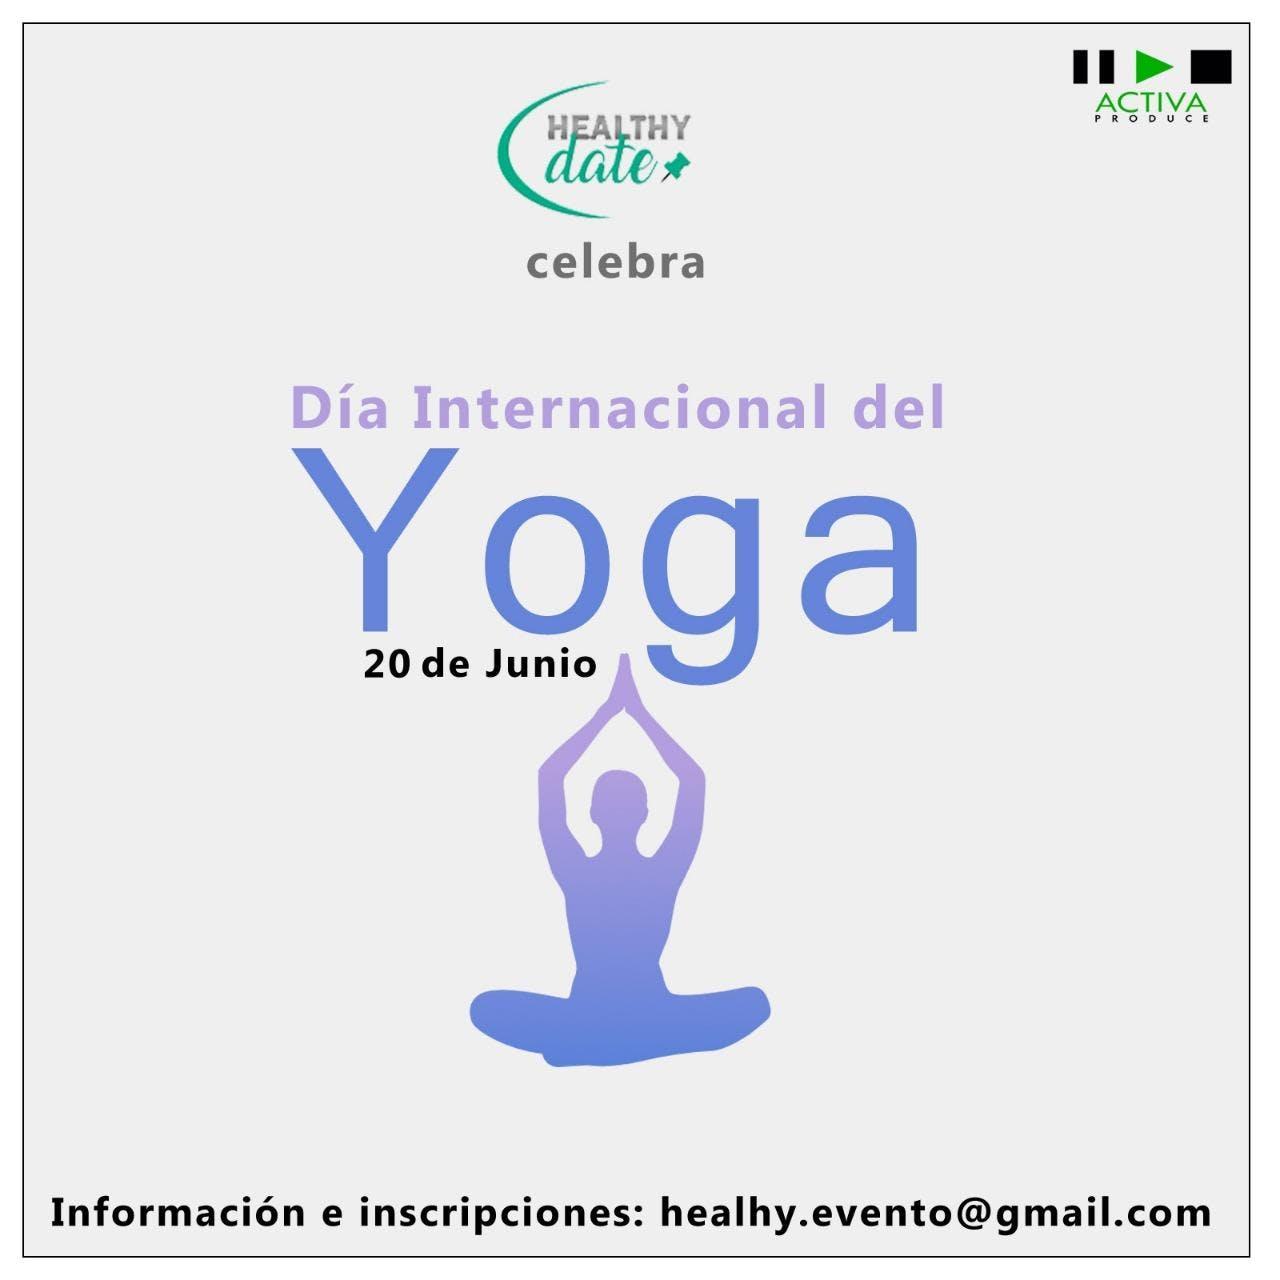 Dia Internacional del Yoga en BA